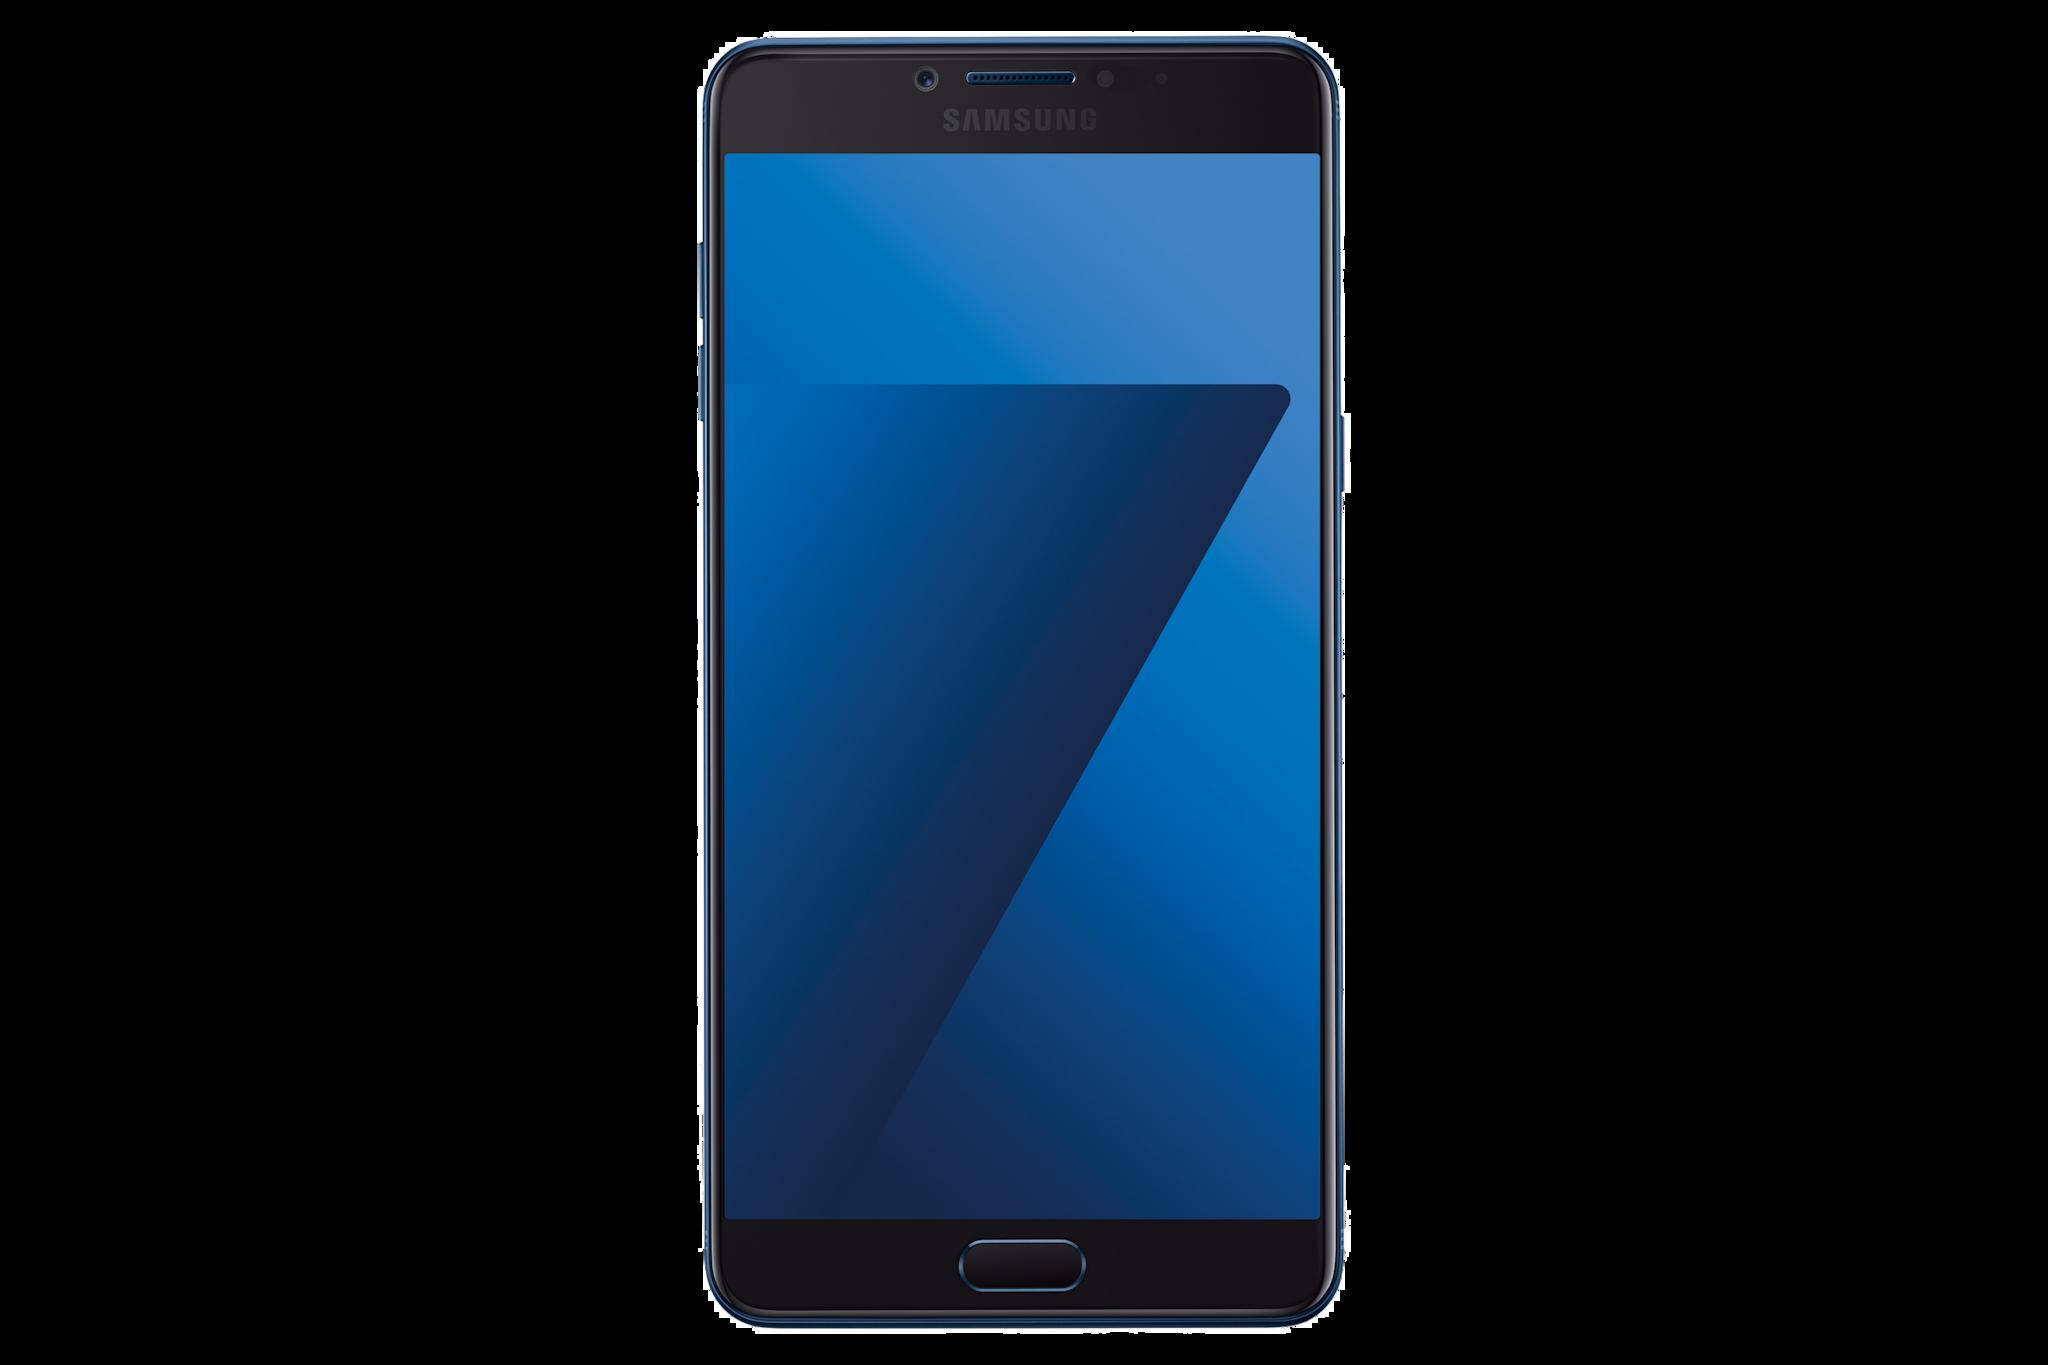 Samsung Galaxy S7 Edge SM G935F 128 GB Black Pearl Galaxy S7 Edge Aakash Enterprises Sector 11 Panchkula